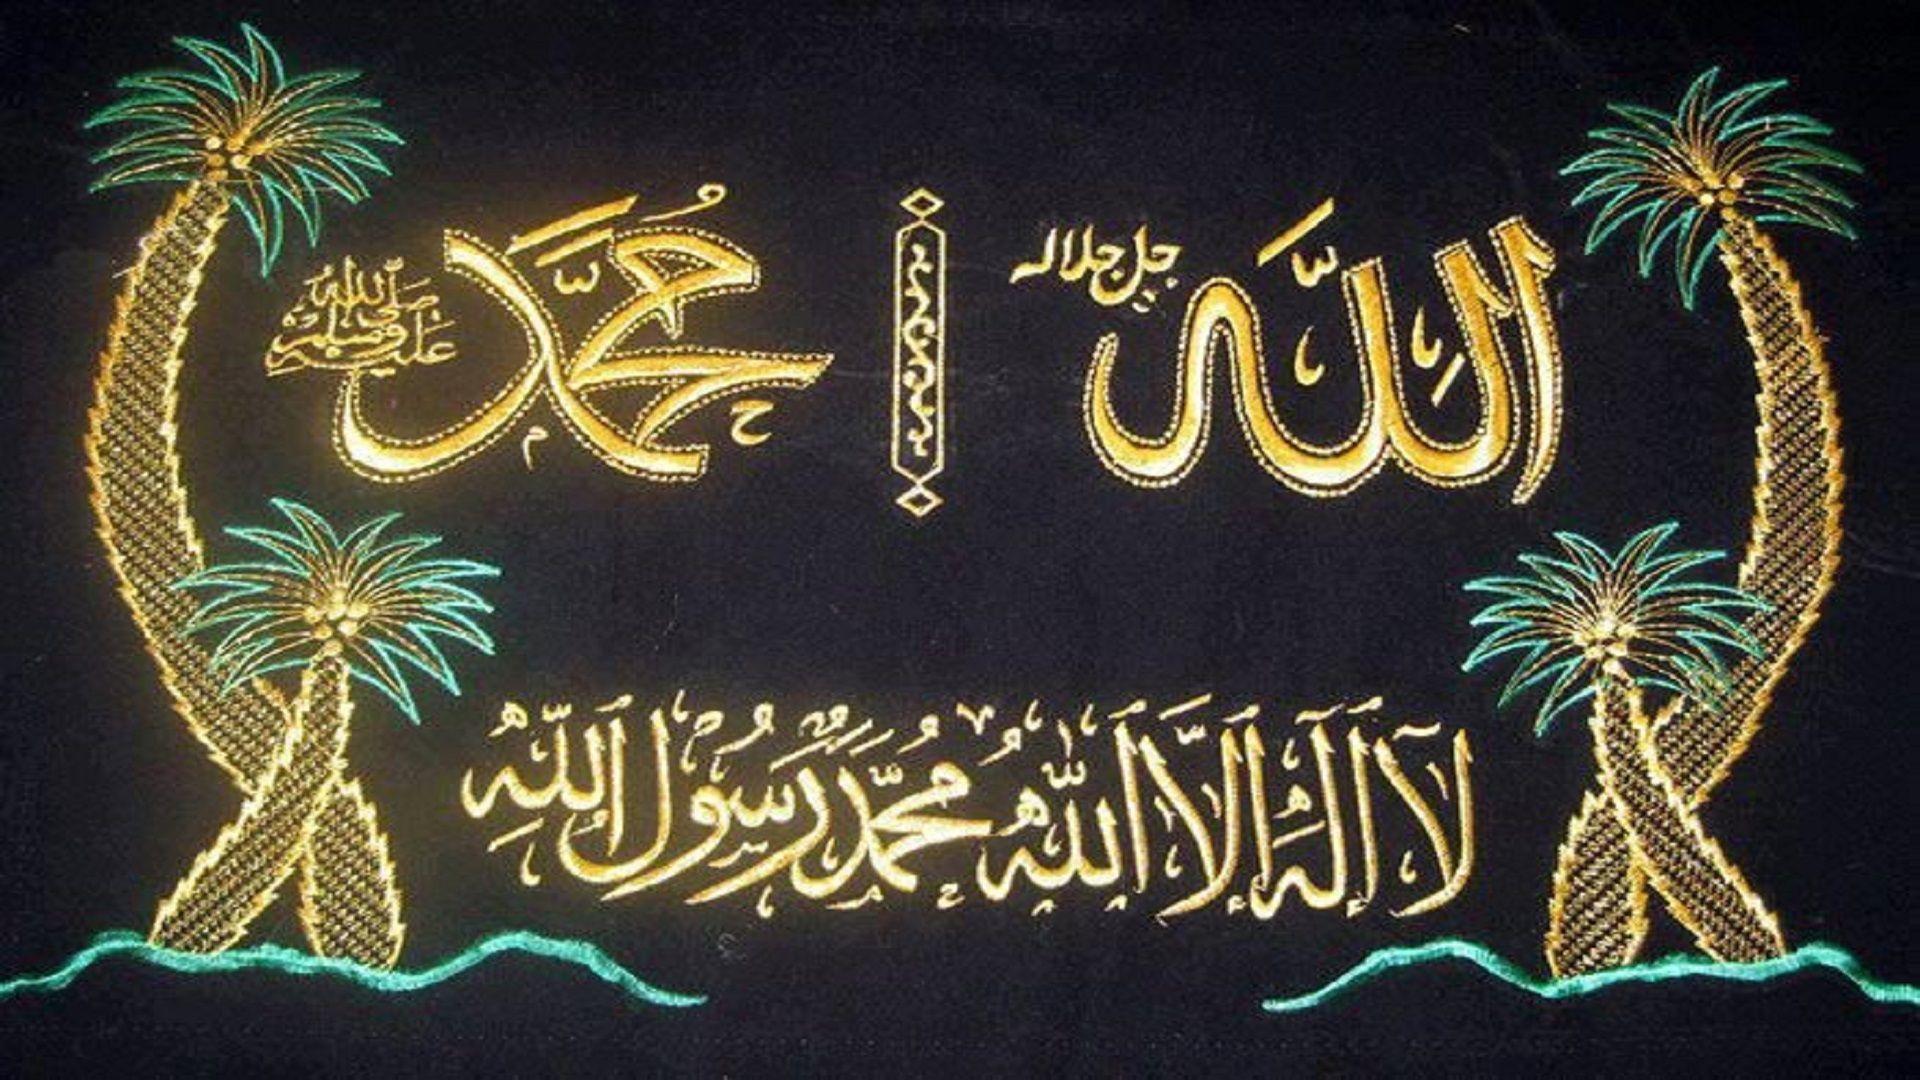 Welcom Onlin Quran Academy Tilawat Quran Natt S Islamic Wallpaper Islamic Wallpaper Hd Allah Flower zaid name wallpaper